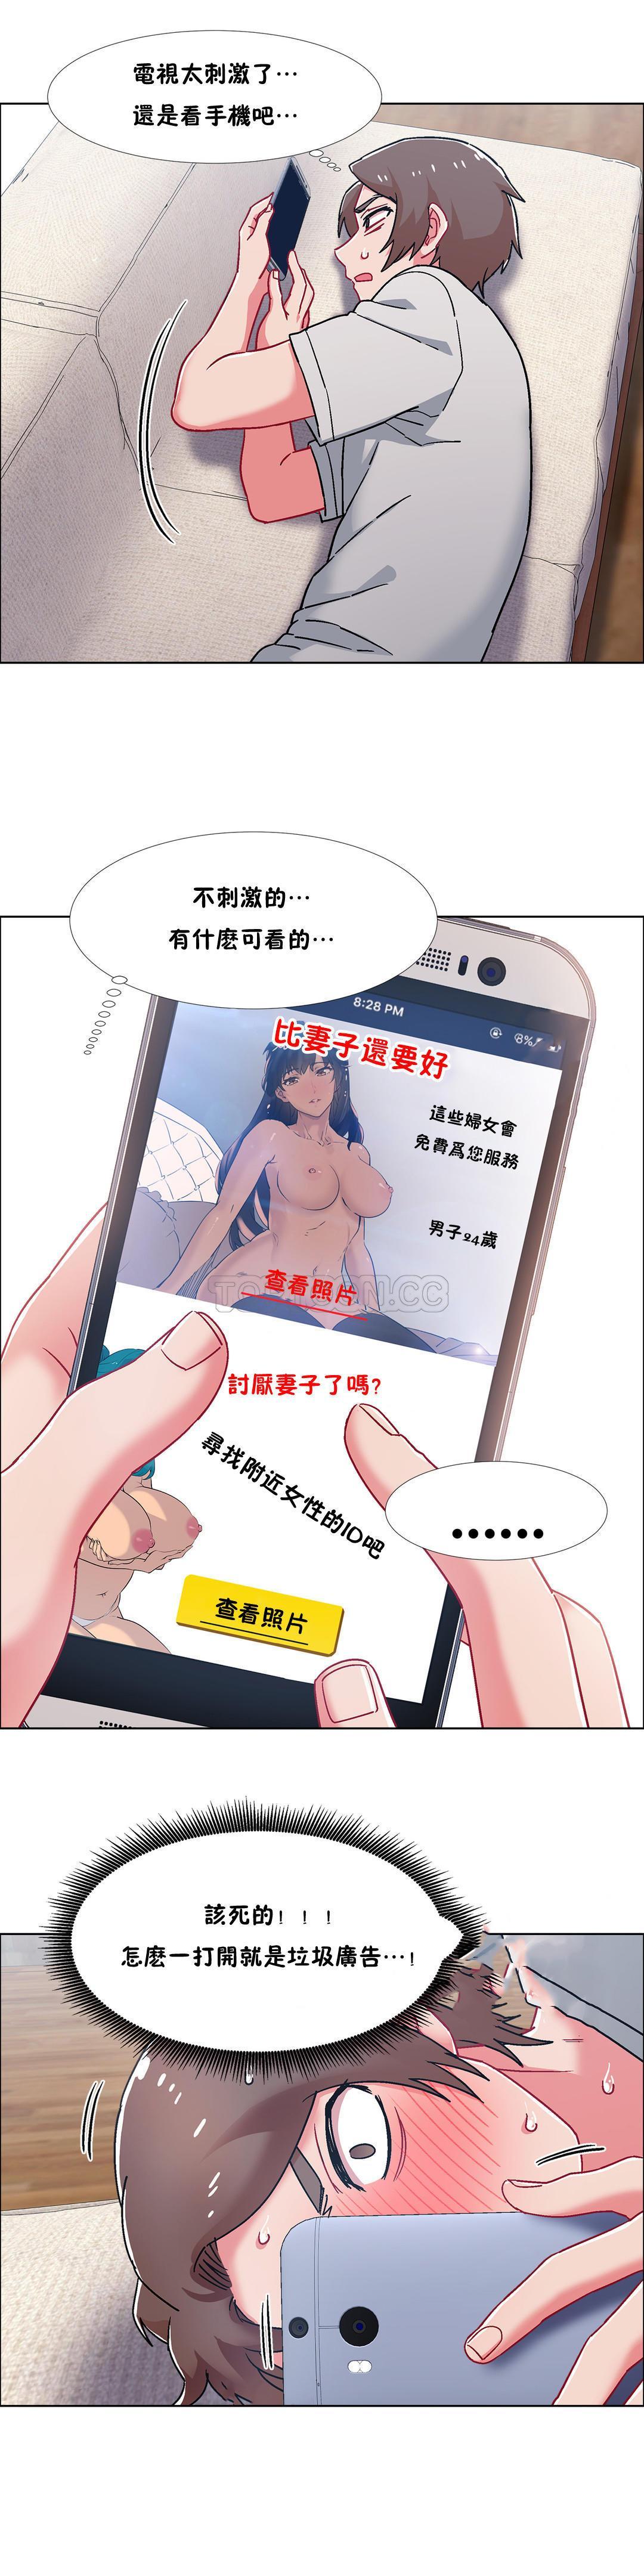 [Studio Wannabe] Rental Girls | 出租女郎 Ch. 33-58 [Chinese]  第二季 完结 466